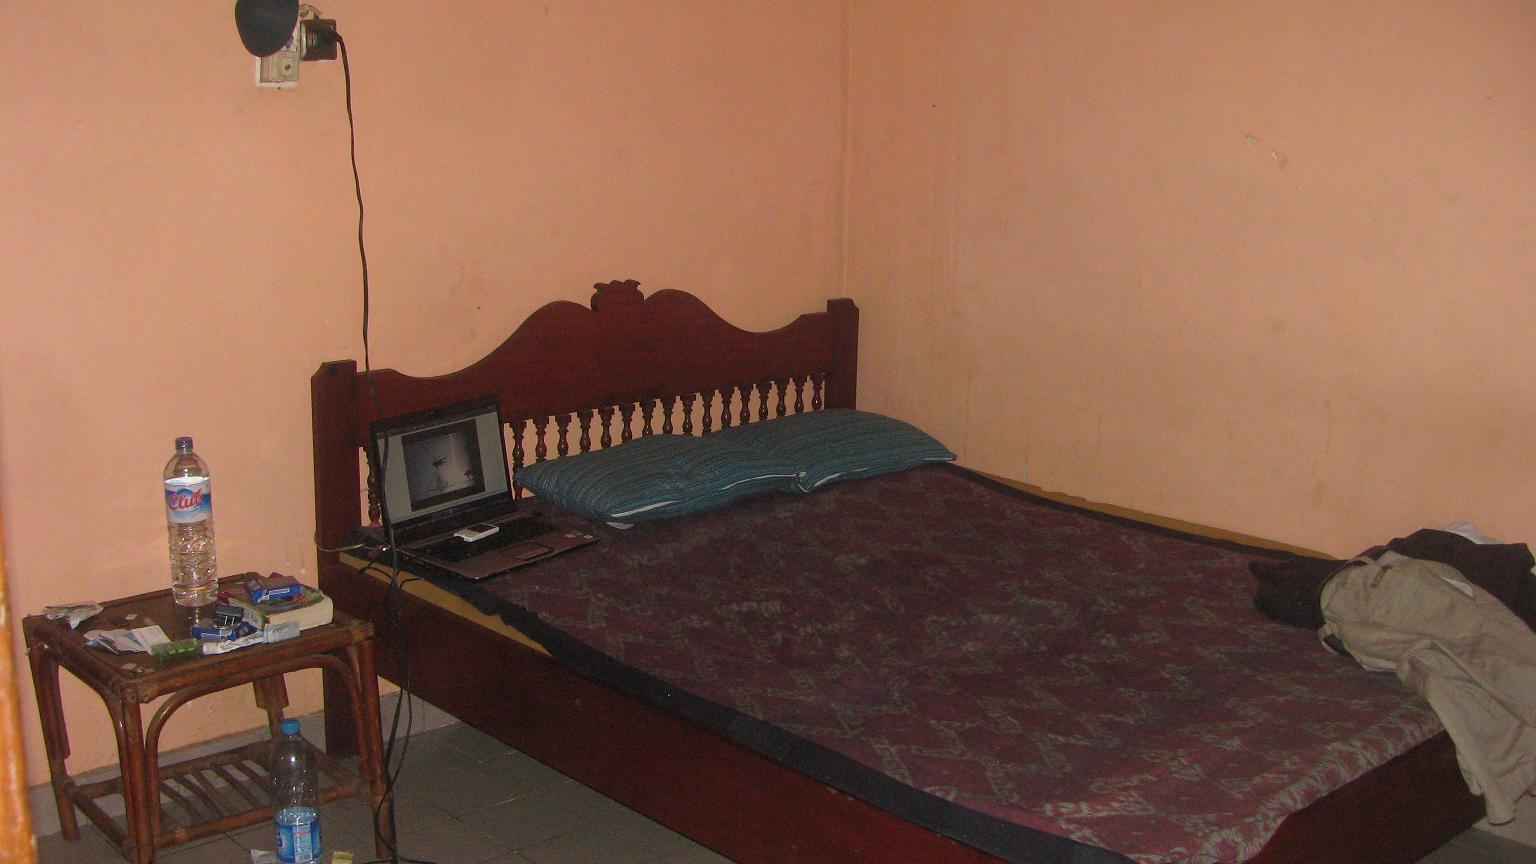 Cheap Hotel Now  Budget Hotel In Kuta And Legian  Bali